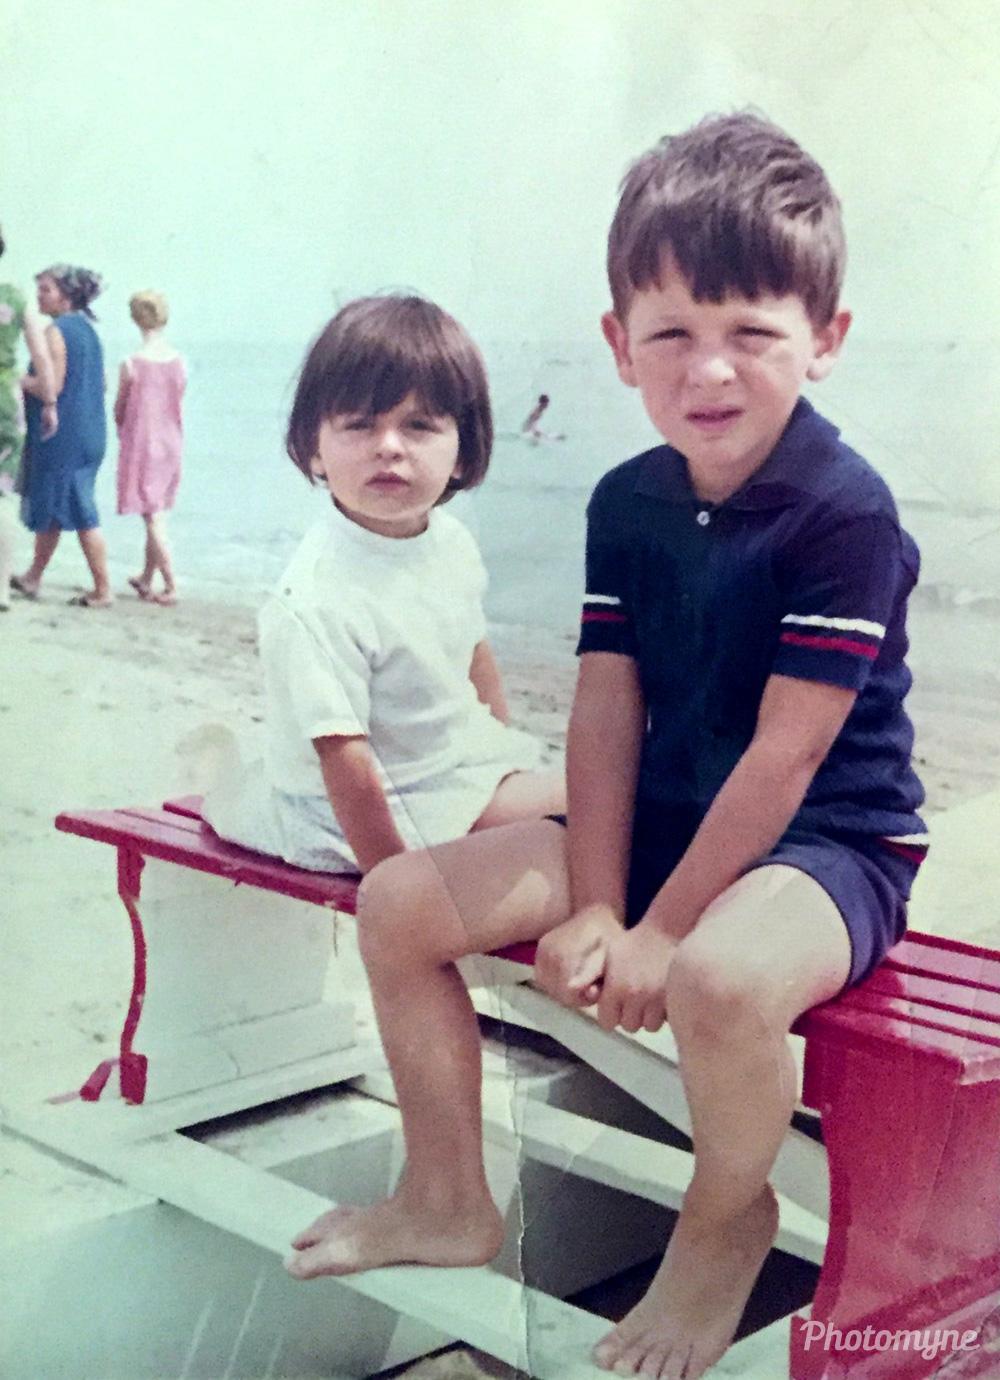 In vacanza a Milano Marittima con Francesco (On holiday in Milano Marittima with Francis), 1968